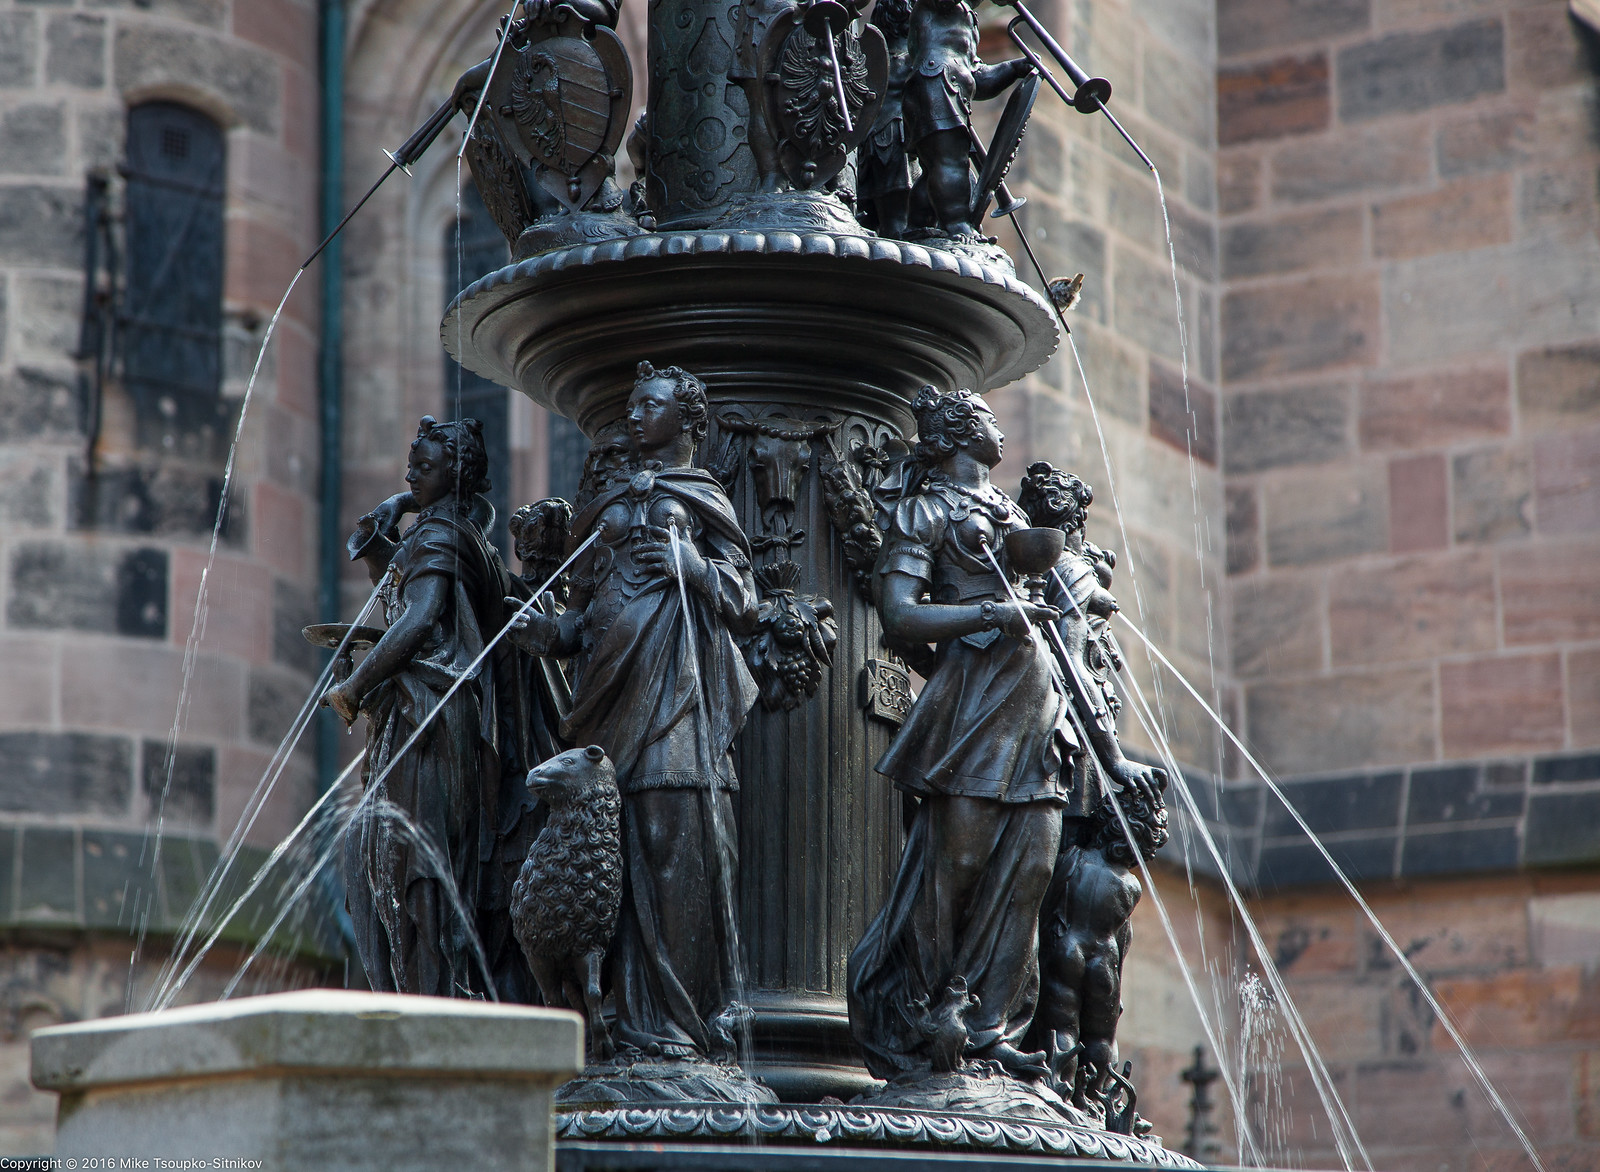 Nuremberg. Tugendbrunnen, or the Fountain of Virtues at Lorenzplatz